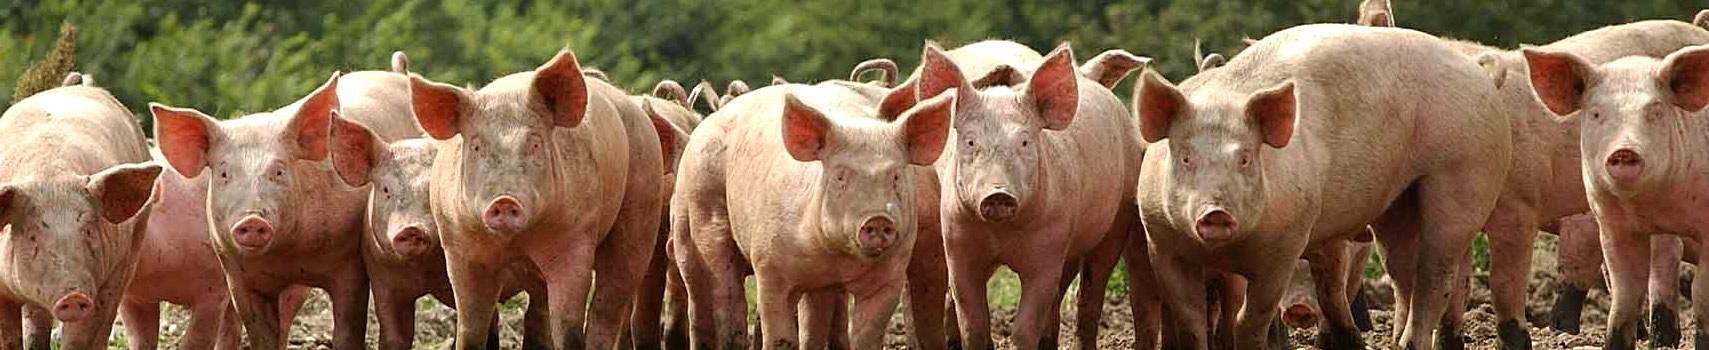 pigs-slide